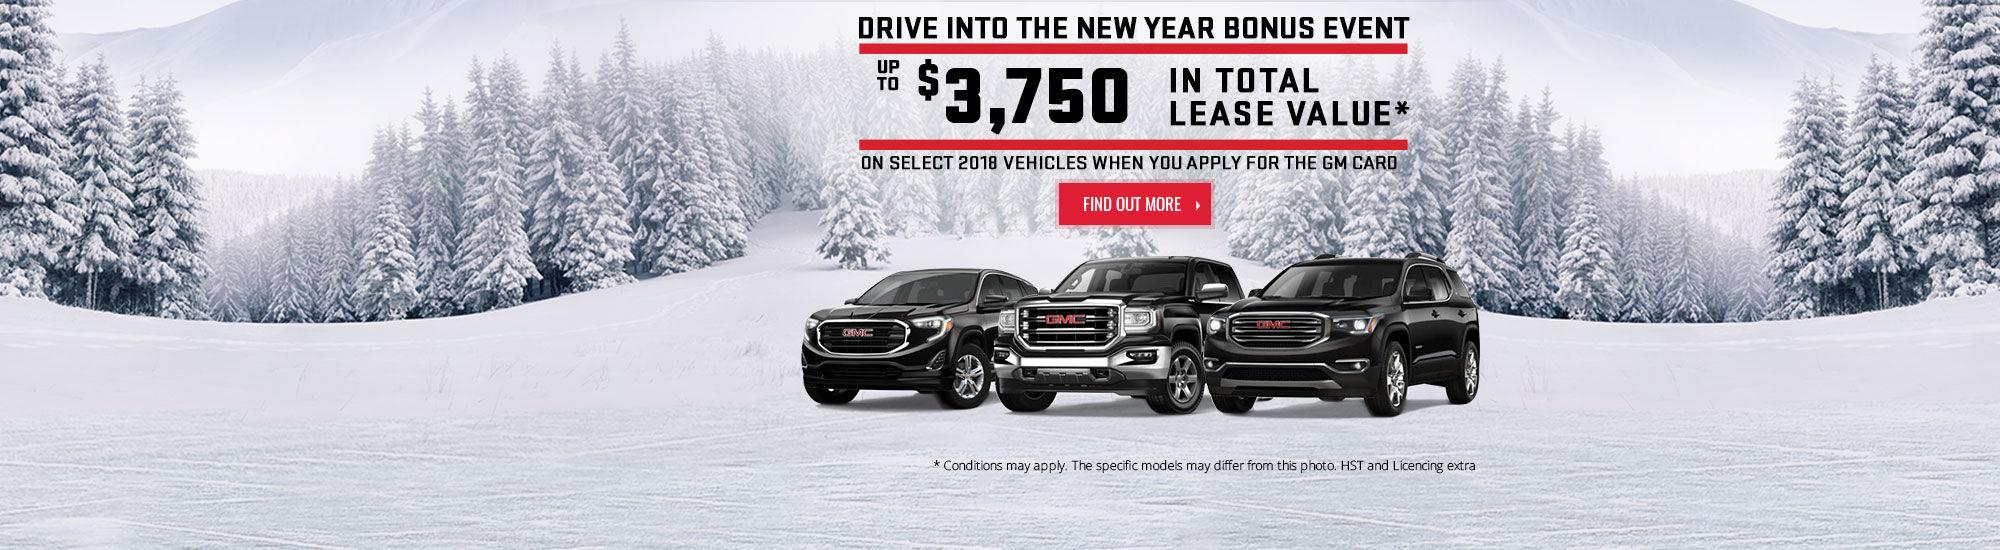 Drive Into the New Year Bonus Event